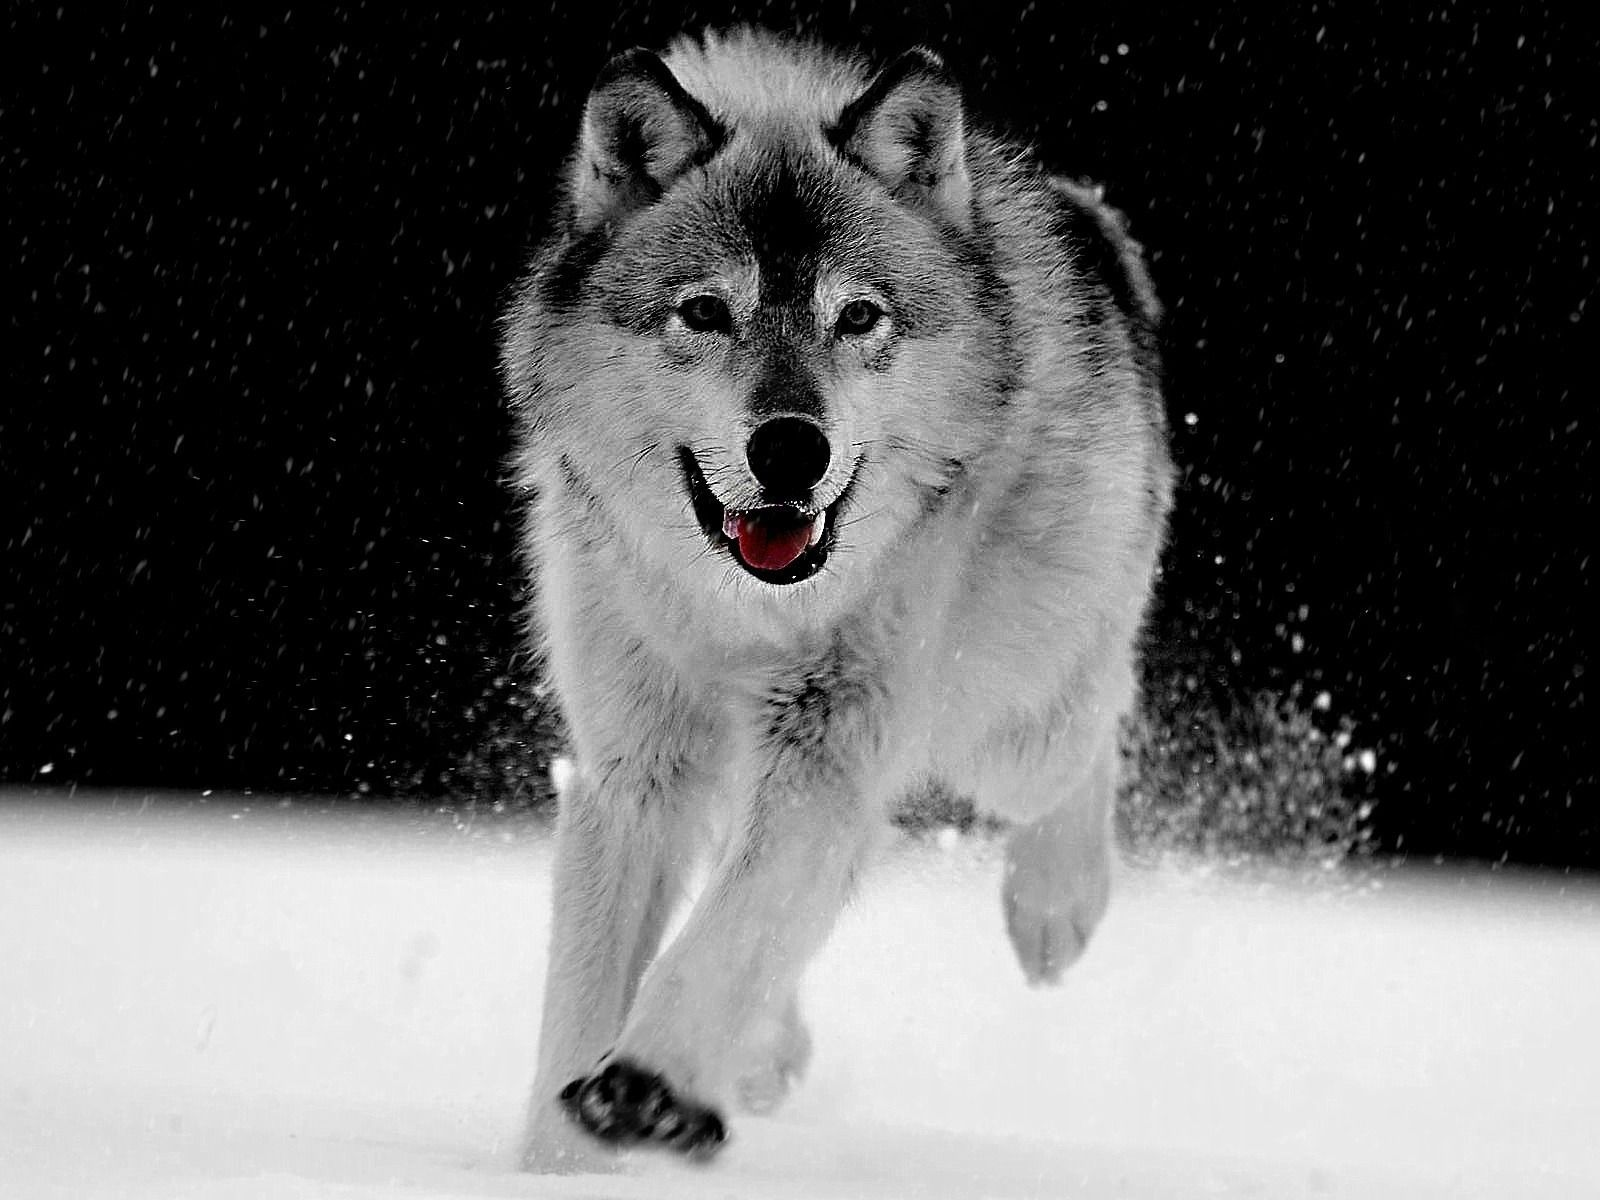 Beautiful Gray Wolf Wallpaper Big - 0ce8010988b799578ff7a944e2c0c761  Best Photo Reference_668062.jpg